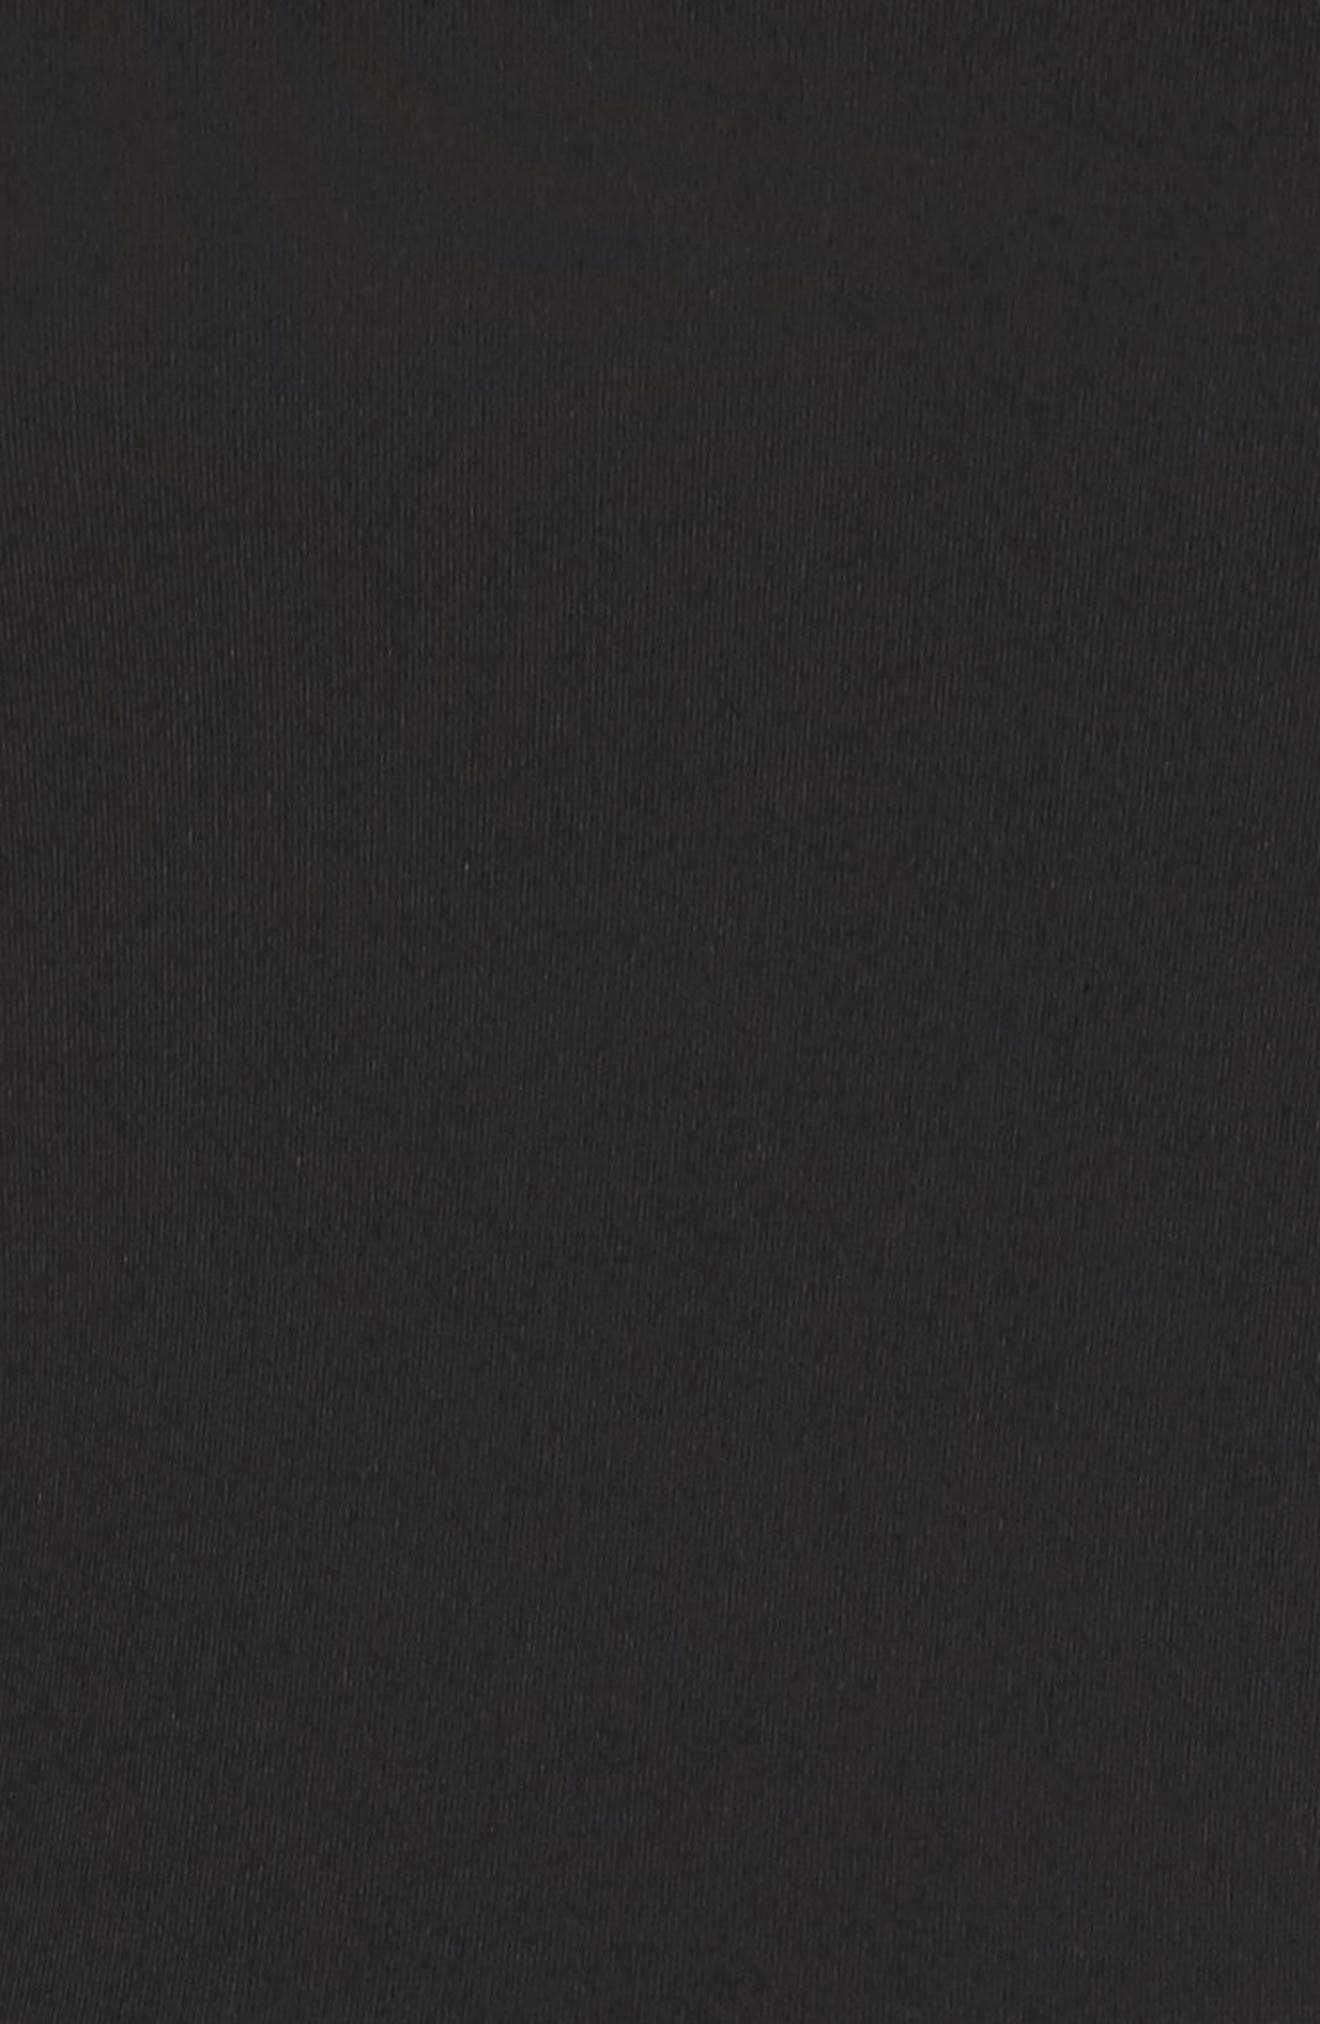 Lyla Fit & Flare Dress,                             Alternate thumbnail 5, color,                             001